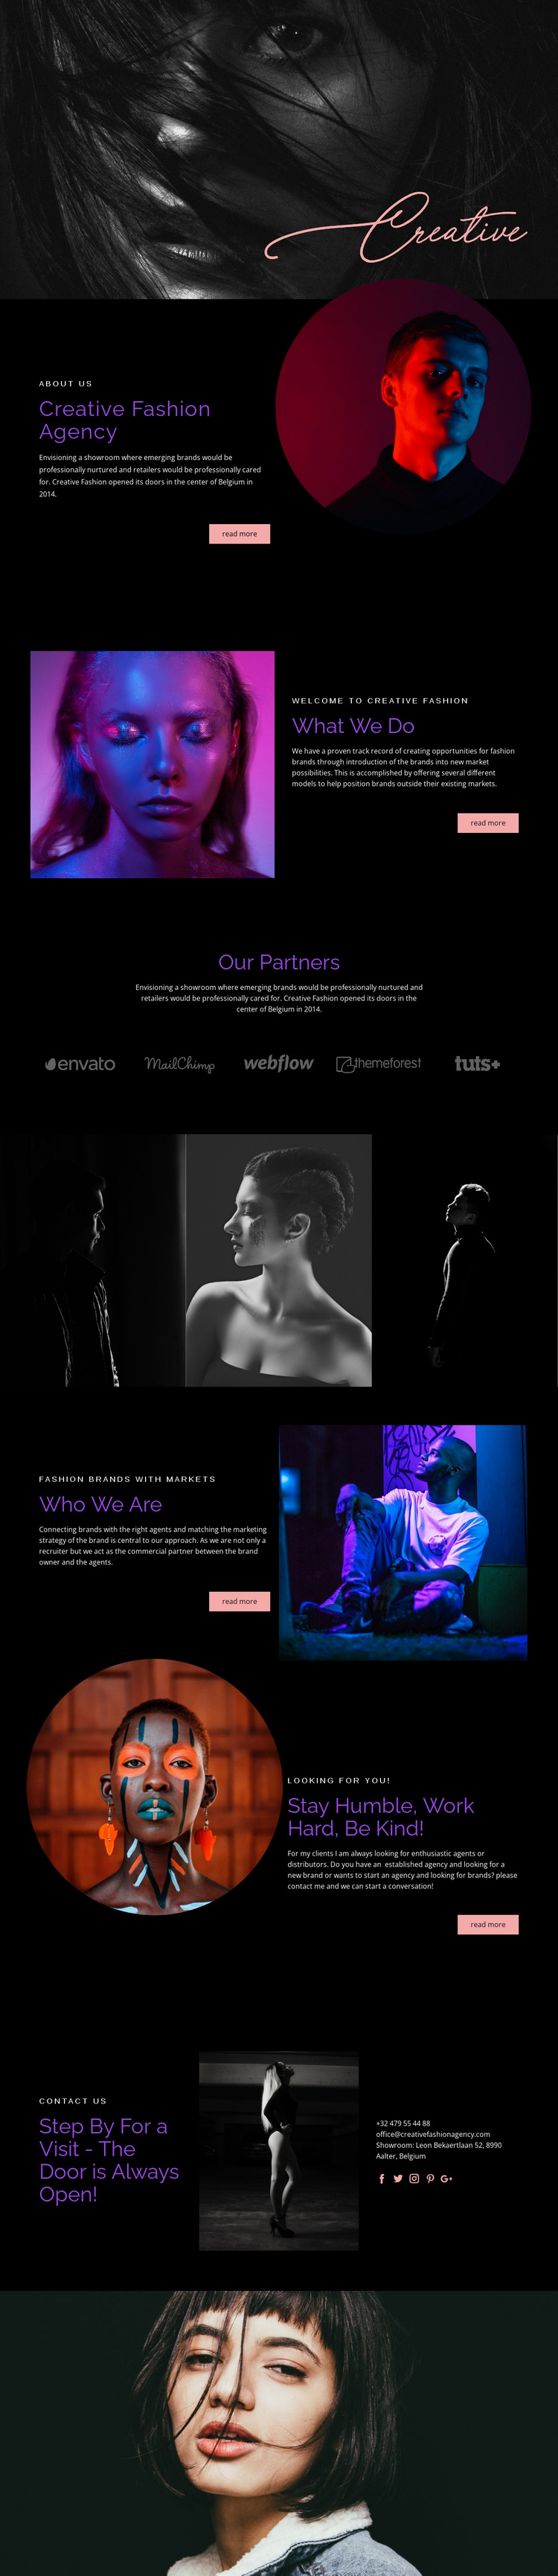 Creative Fashion Agency HTML5 Template